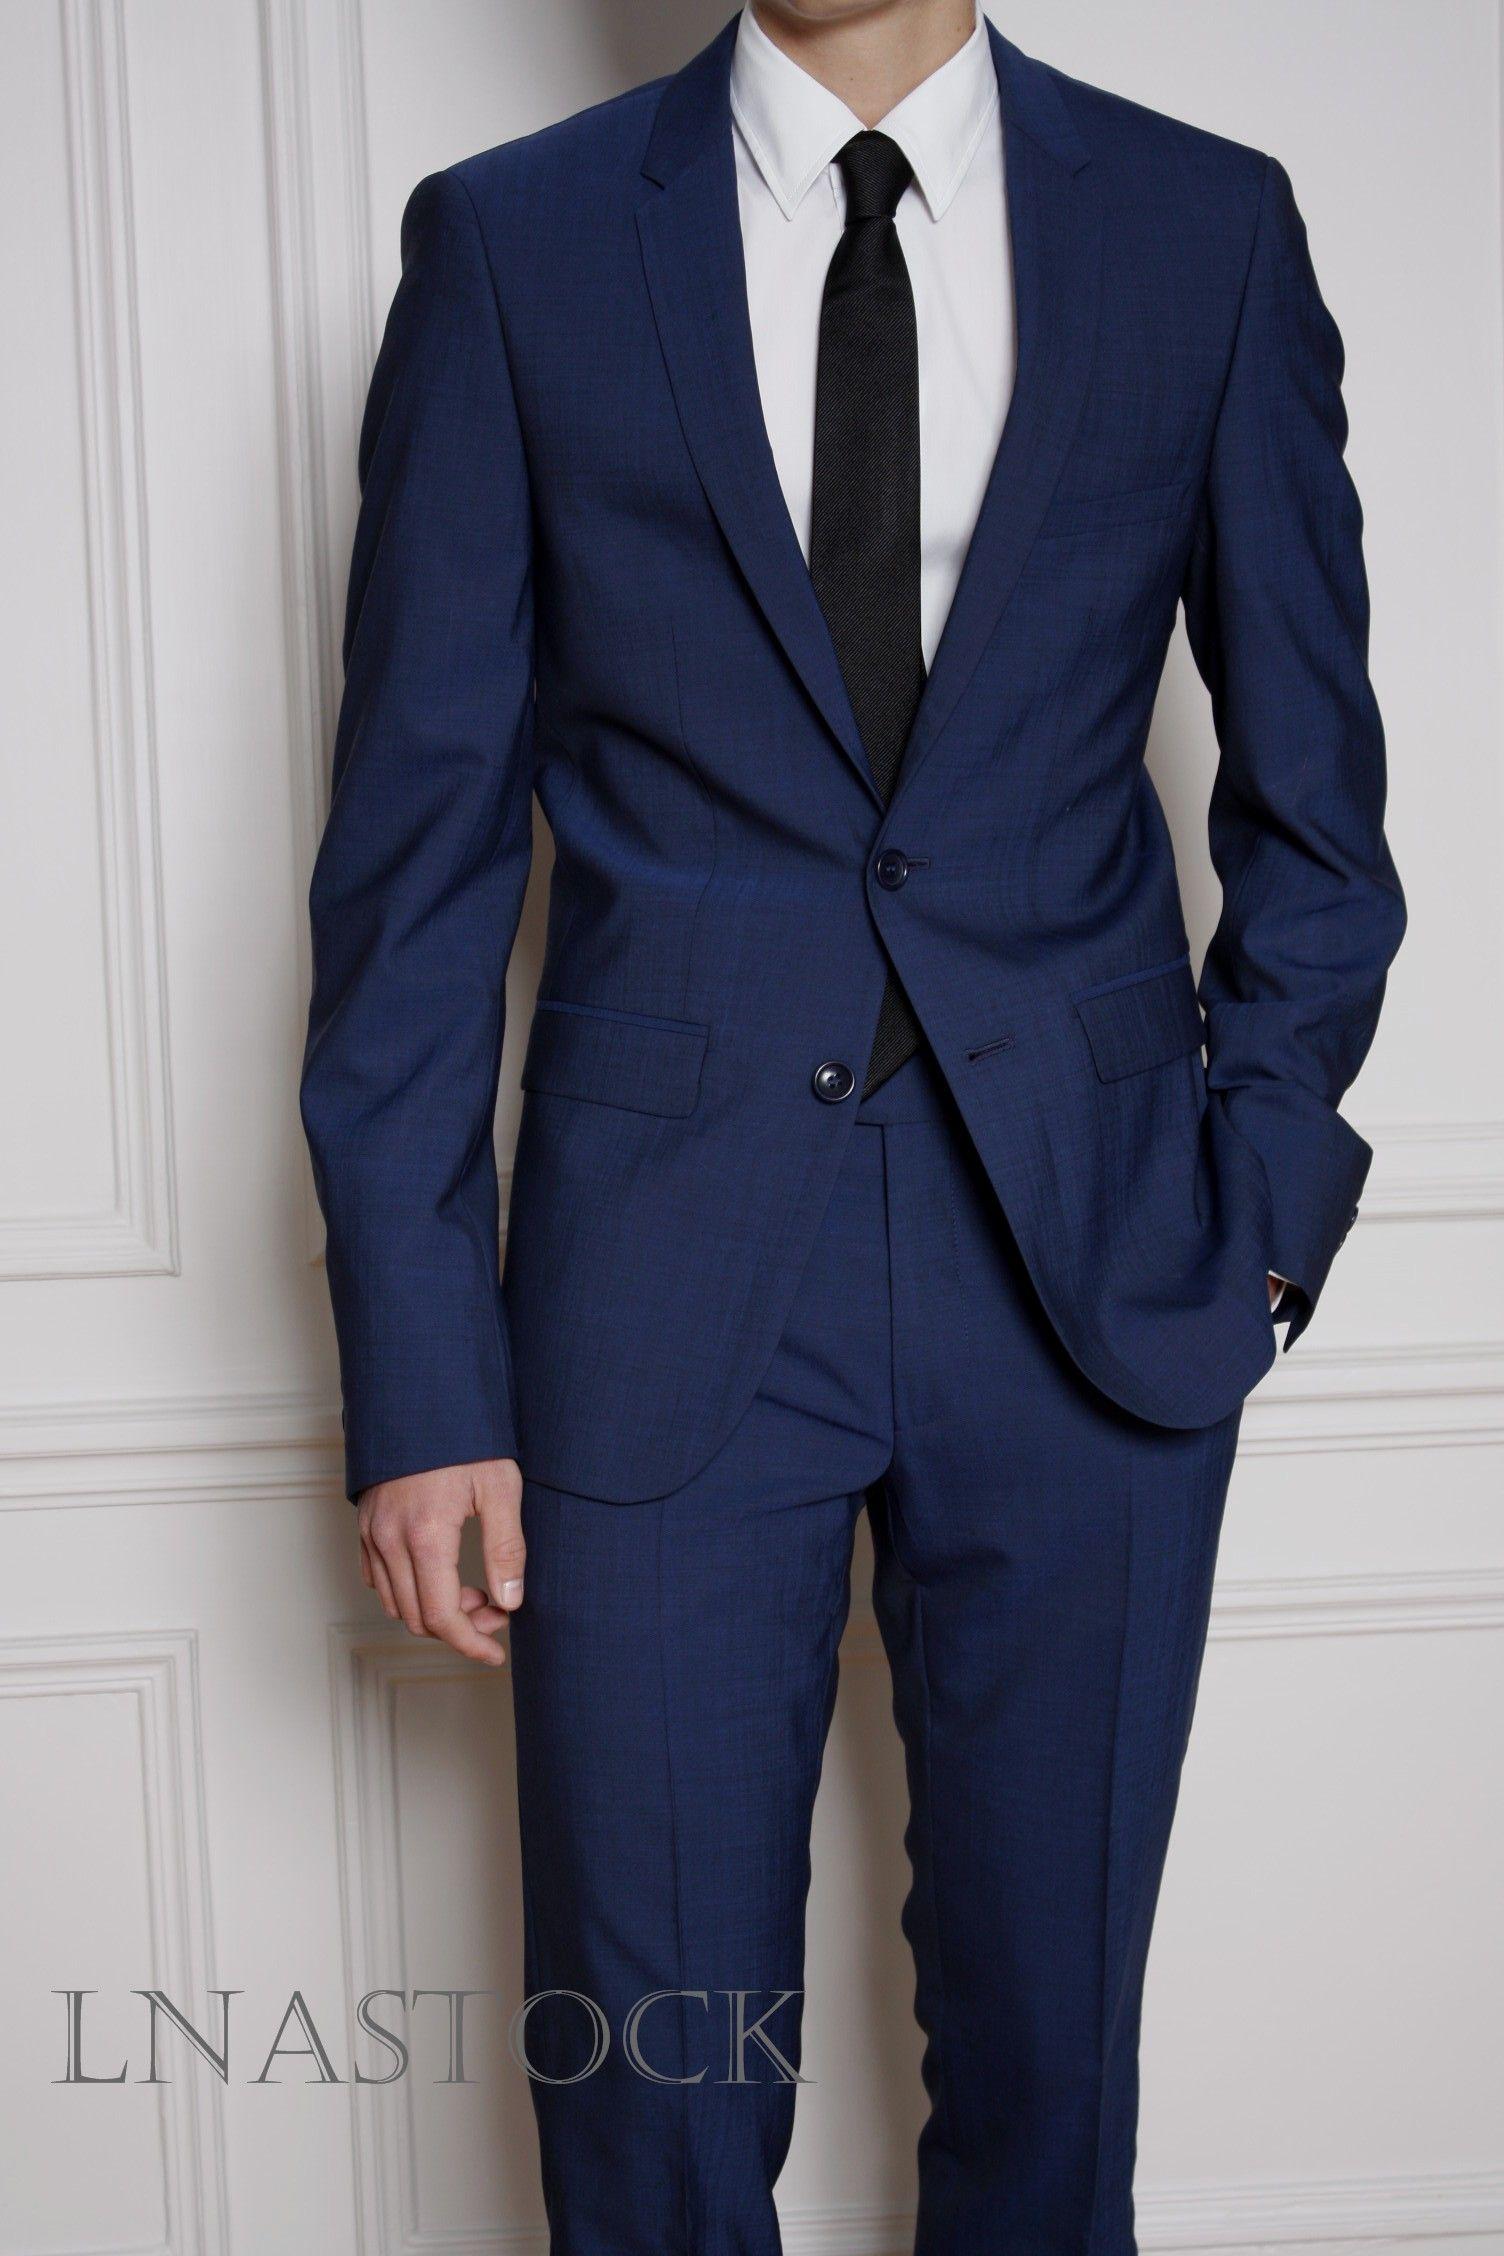 Costume Lanificio F.lli Cerruti 1881 bleu tendance   Costume ... 462b4698bcc0